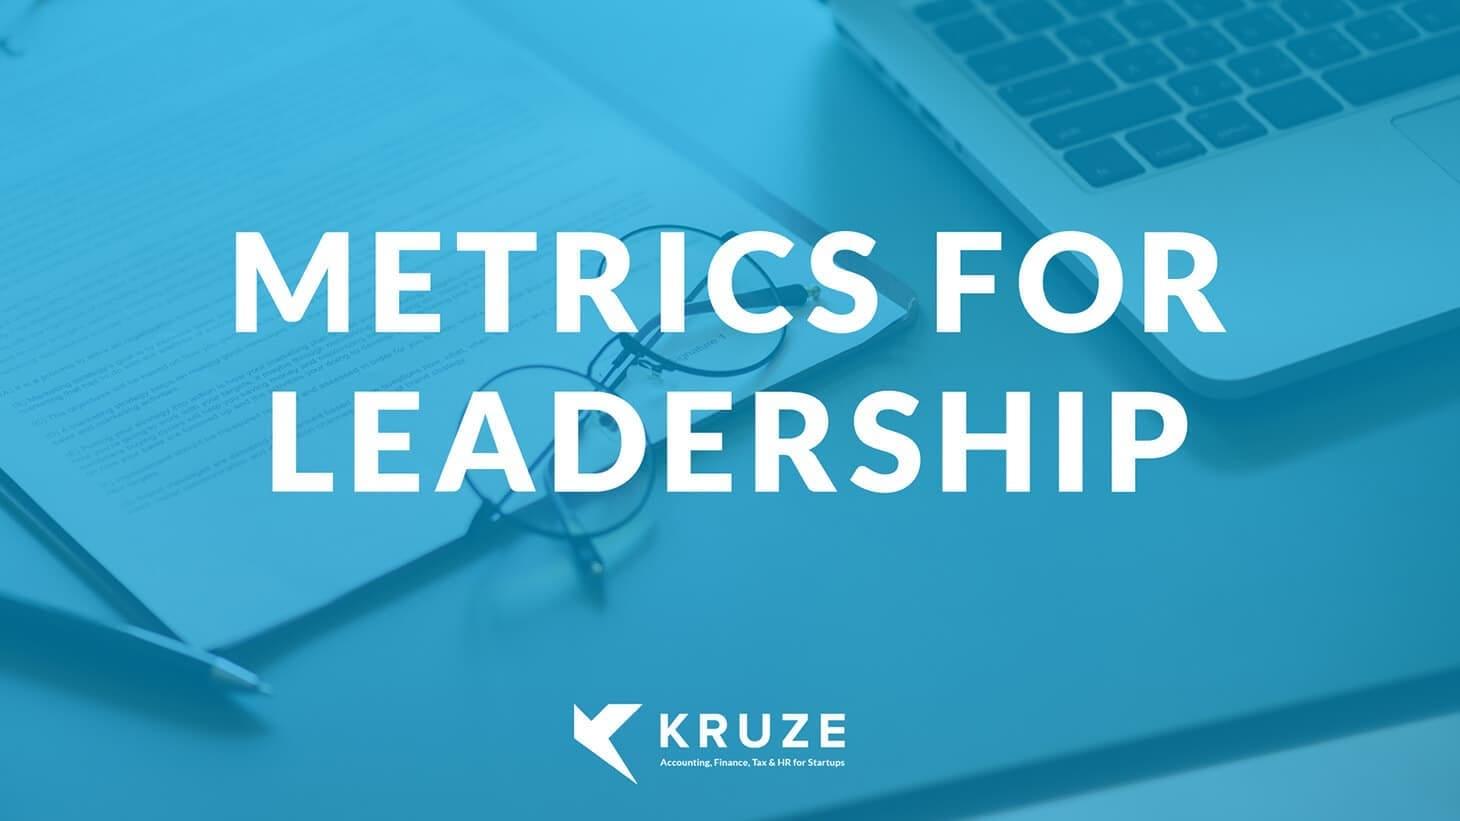 Metrics for Leadership